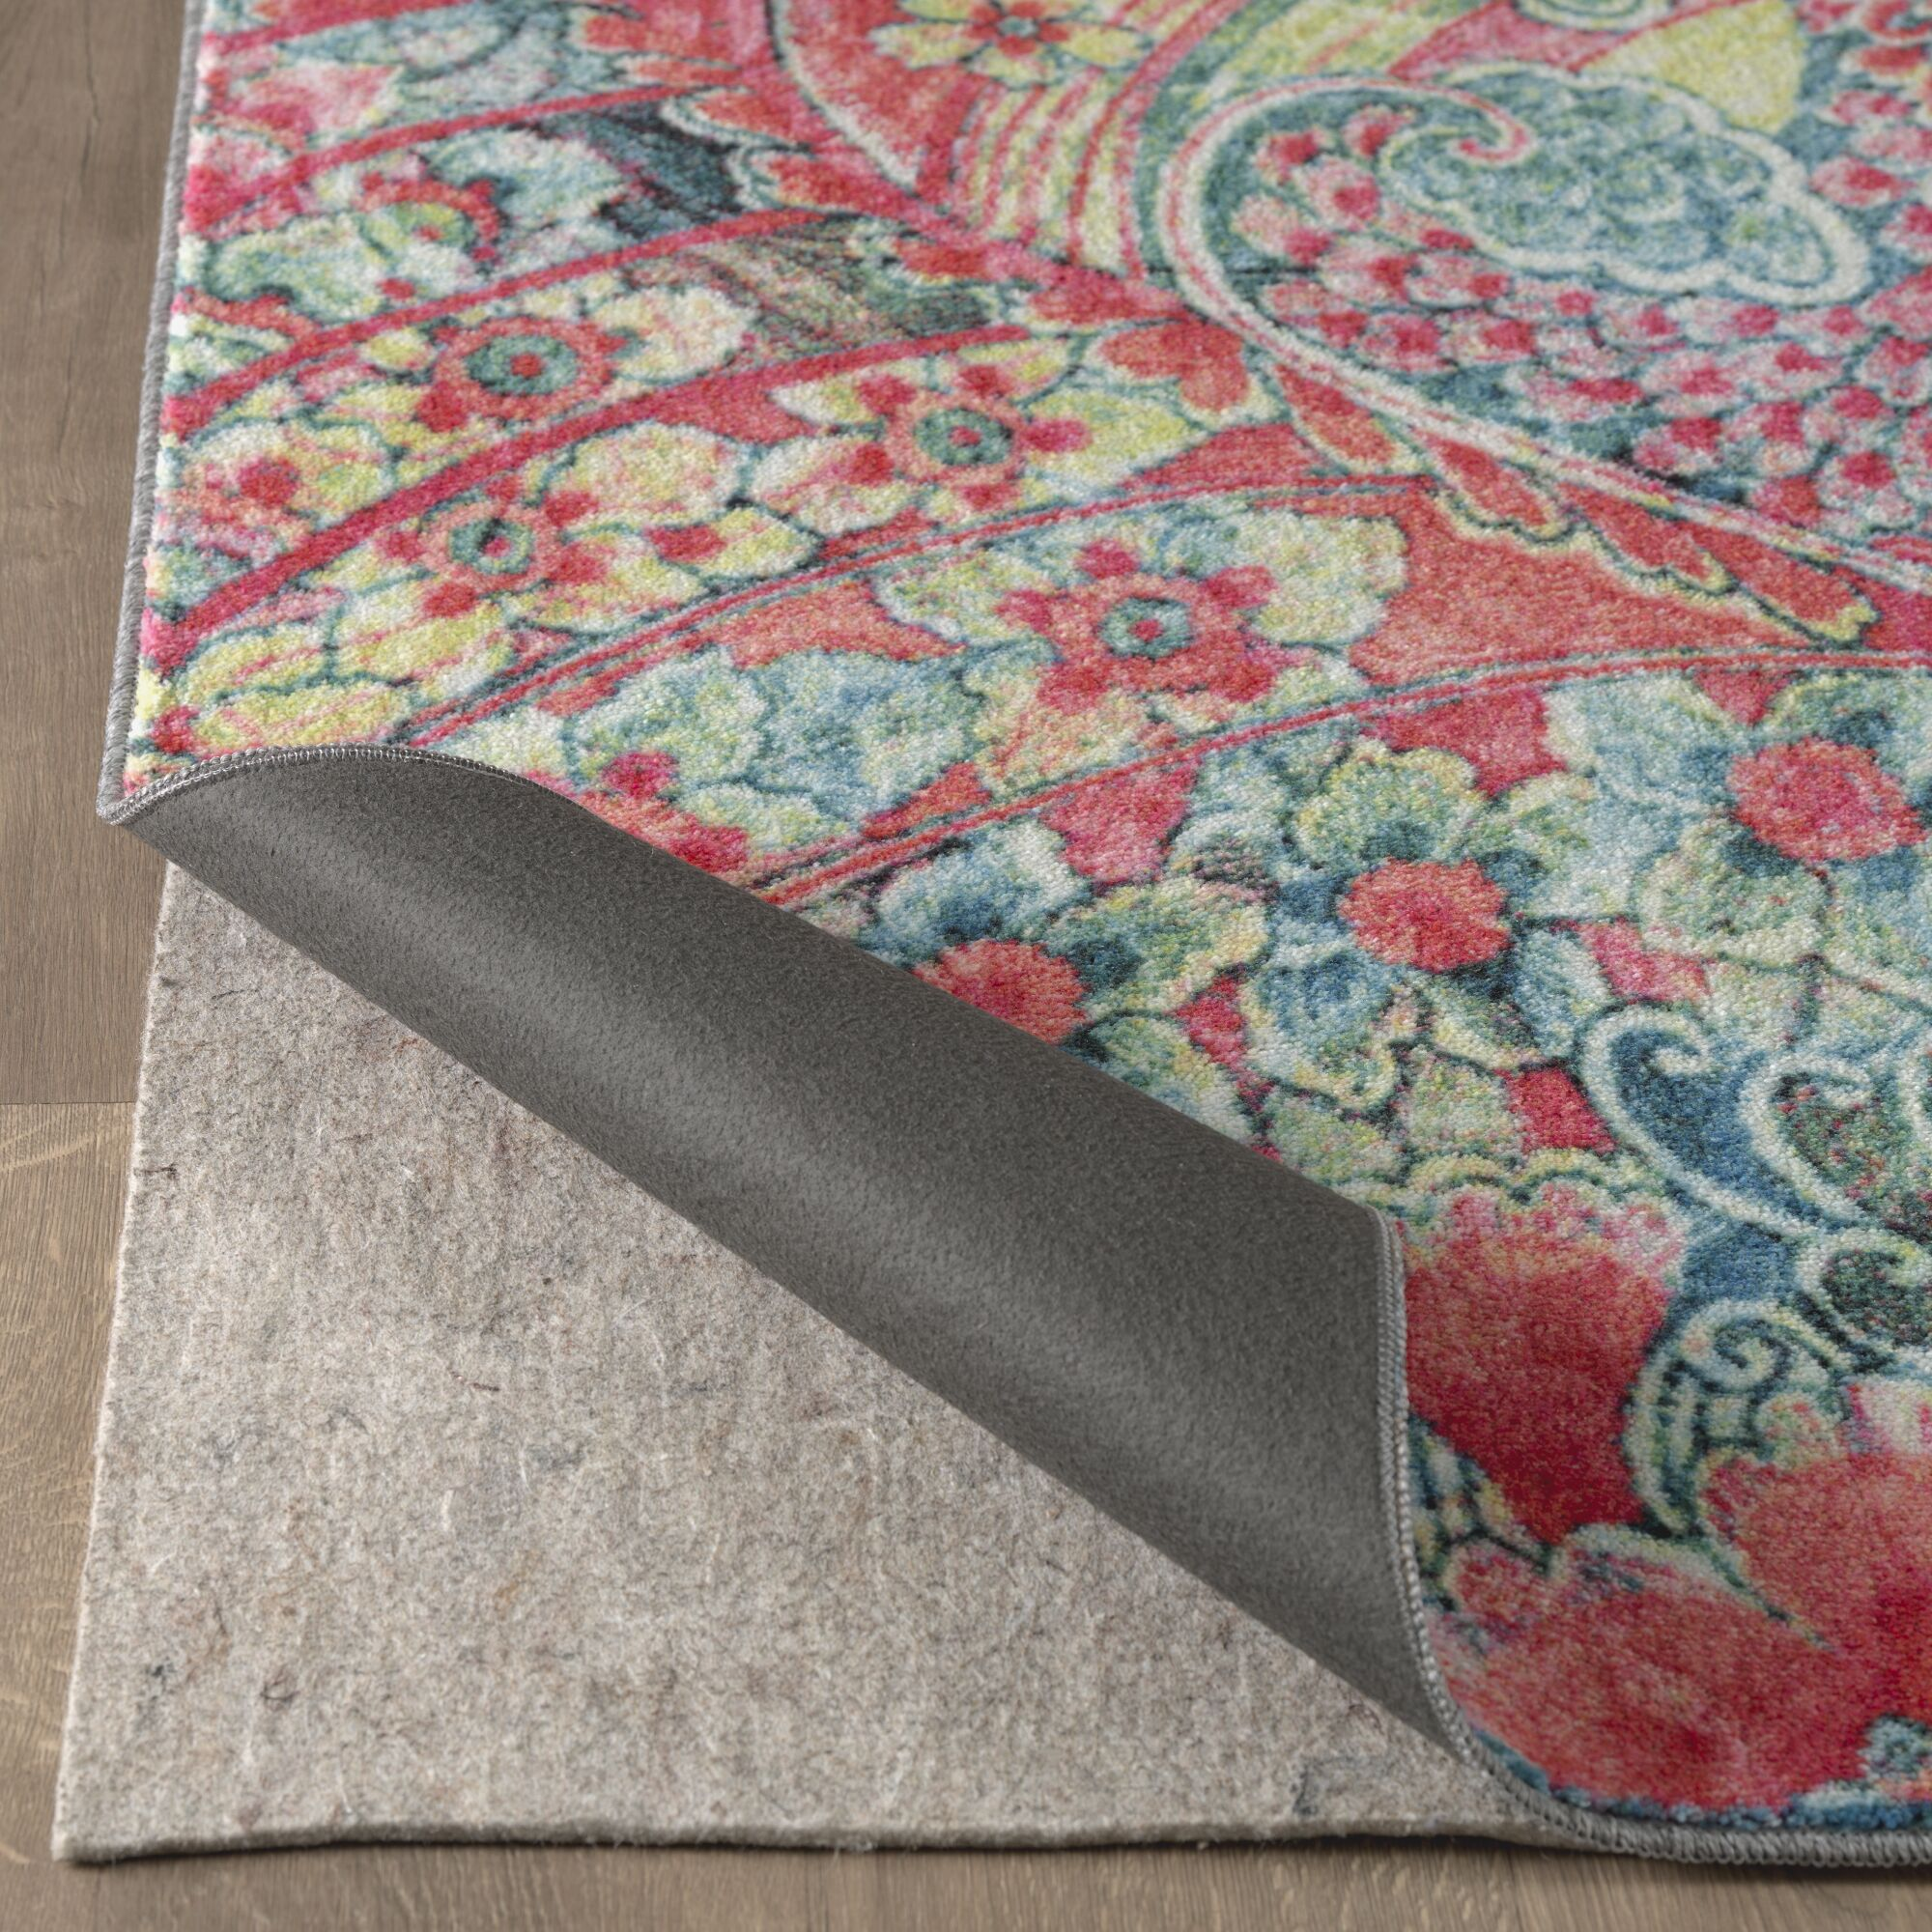 Edinboro Tropical Pink Area Rug Rug Size: Rectangle 8' x 10'